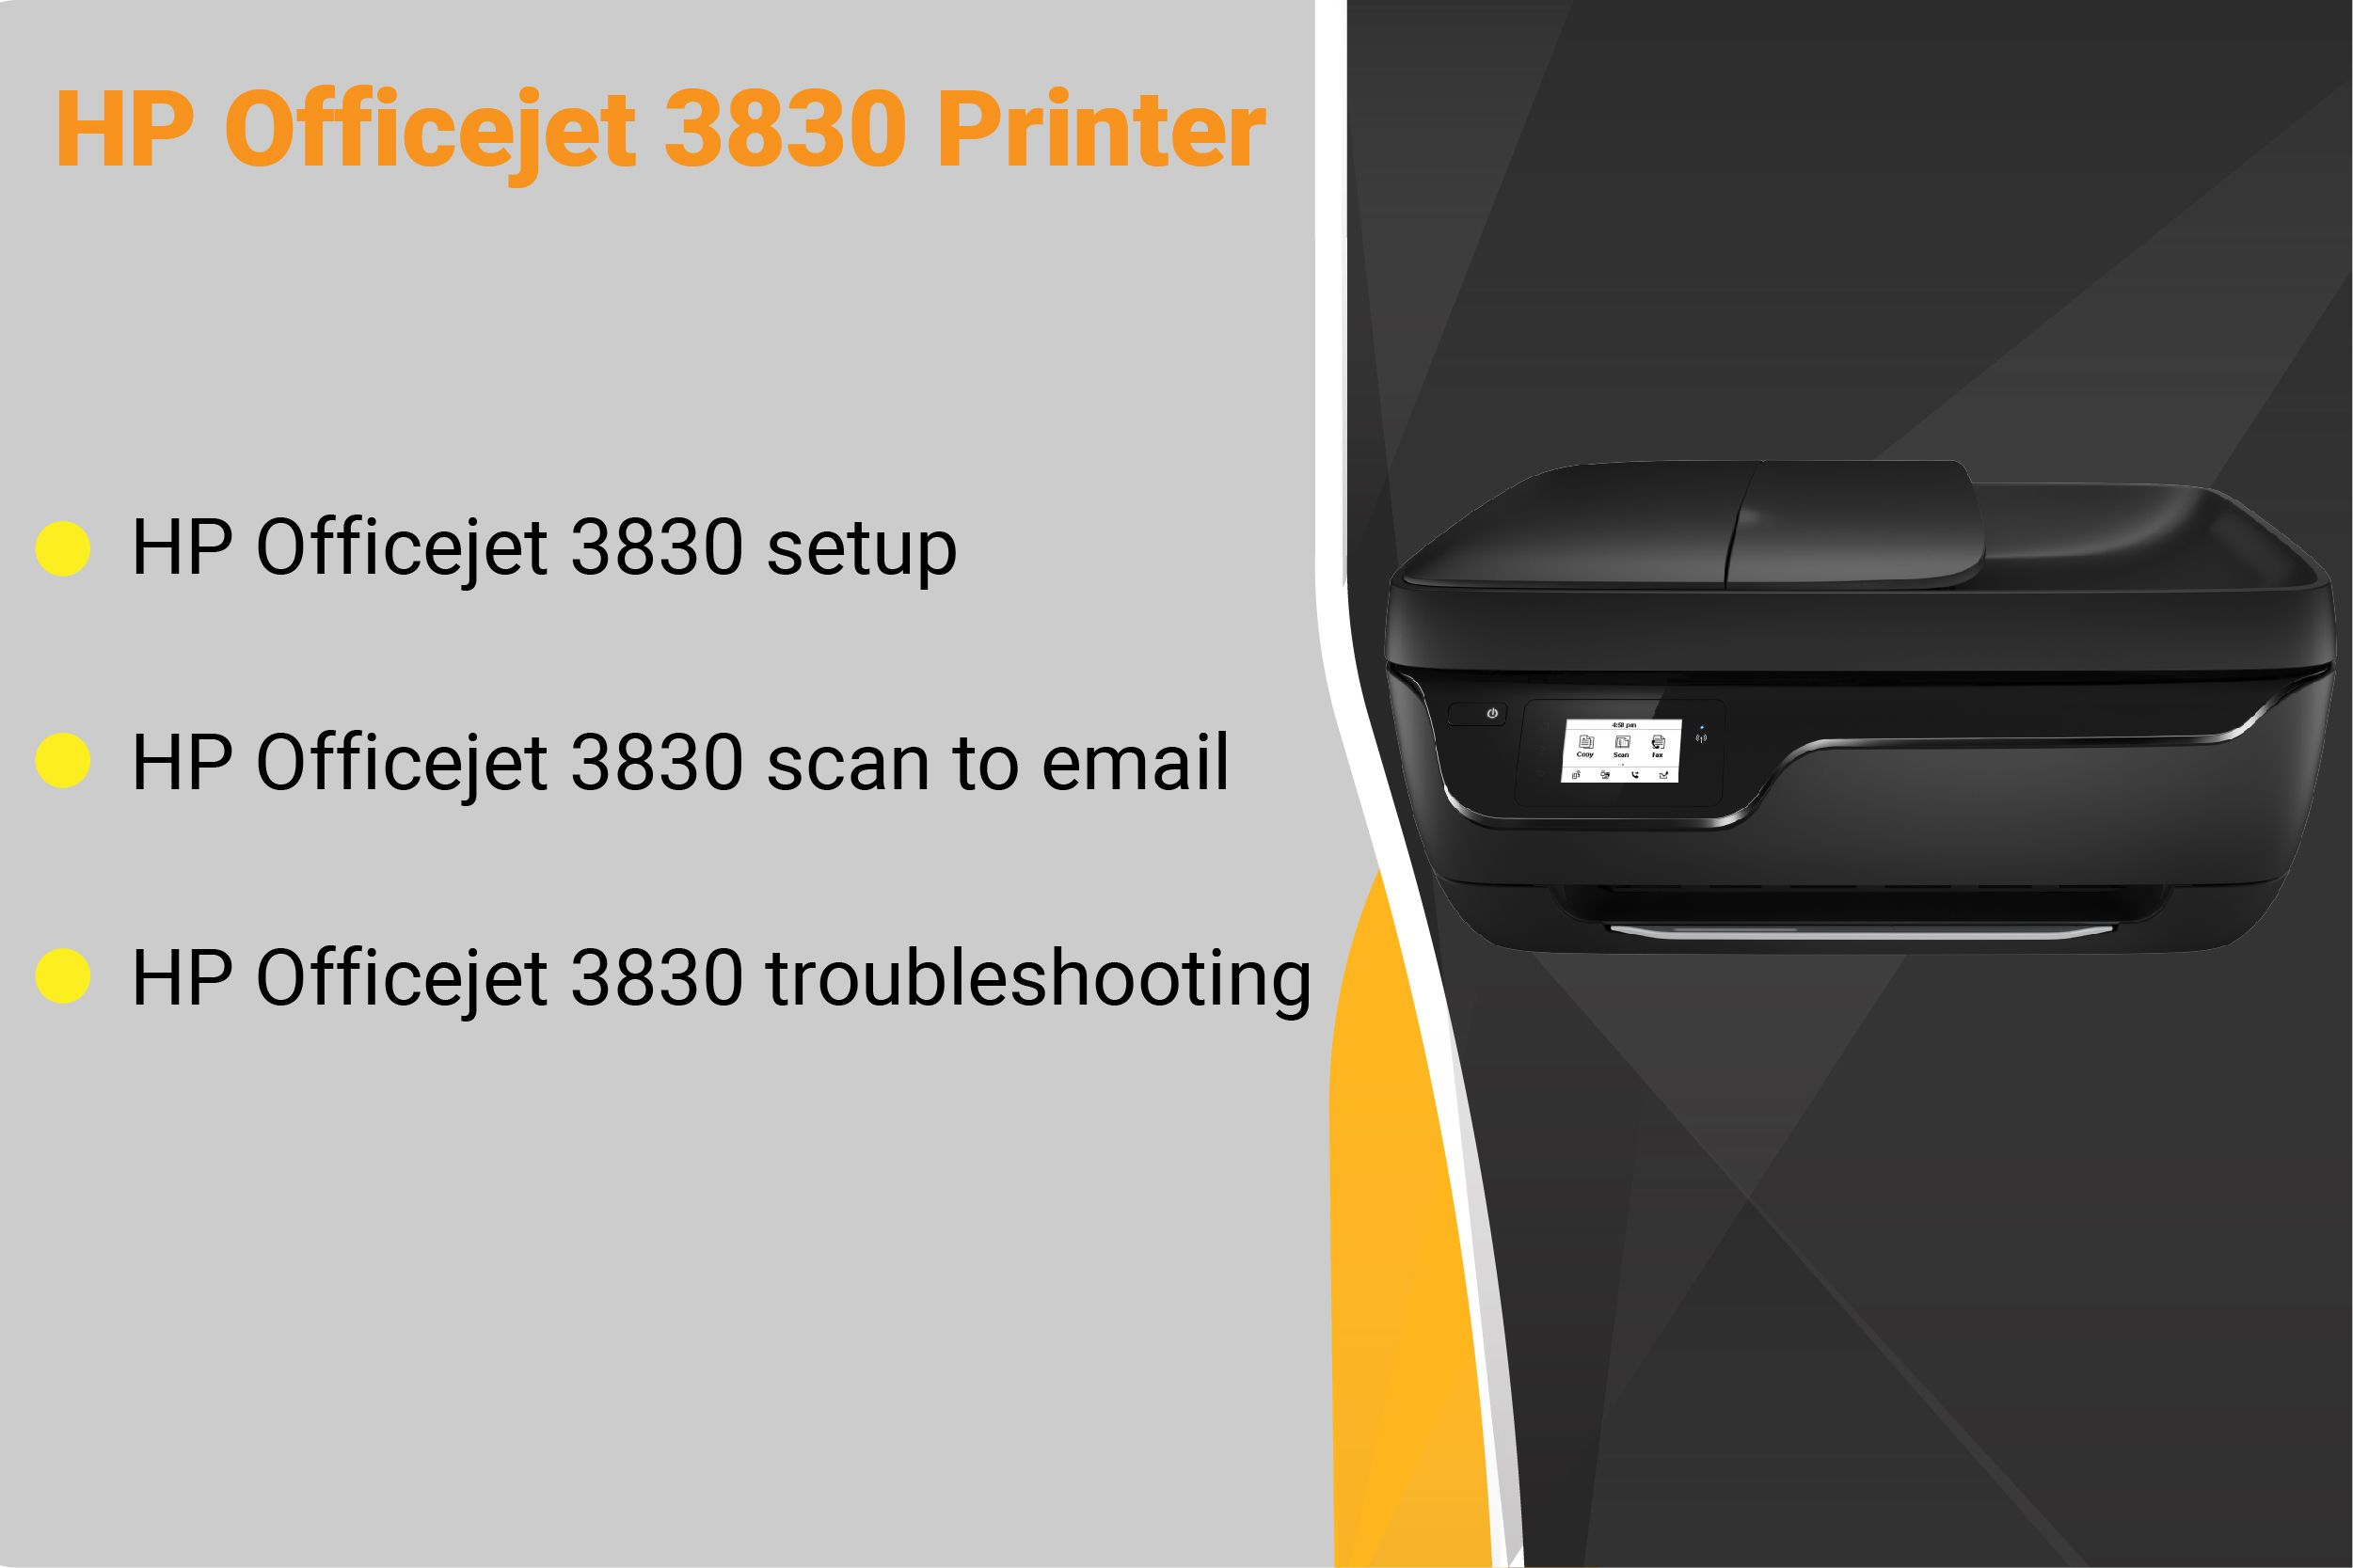 Hp Officejet 3830 Troubleshooting Hp Officejet Printer Samsung Galaxy Phone